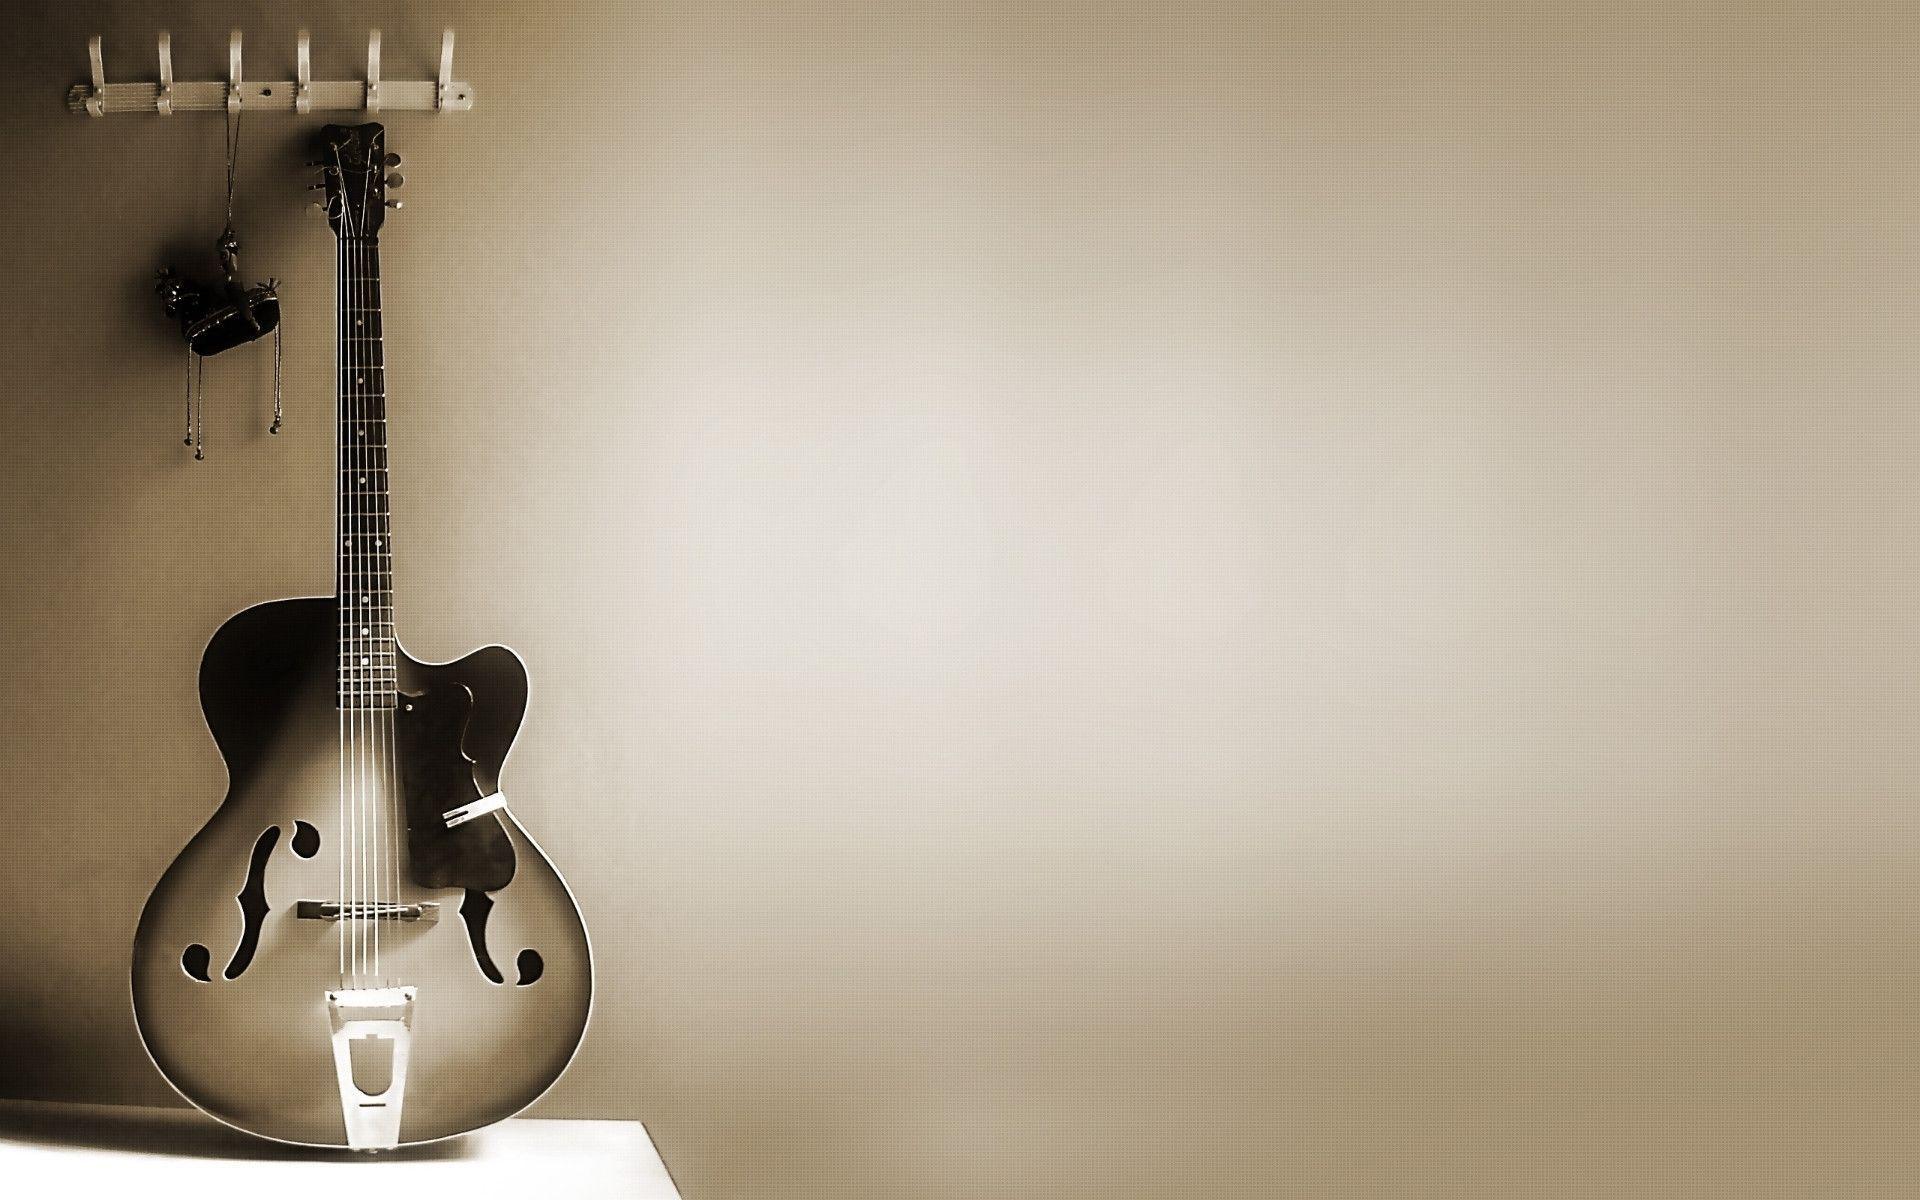 Картинка: Гитара, струны, стена, серый фон